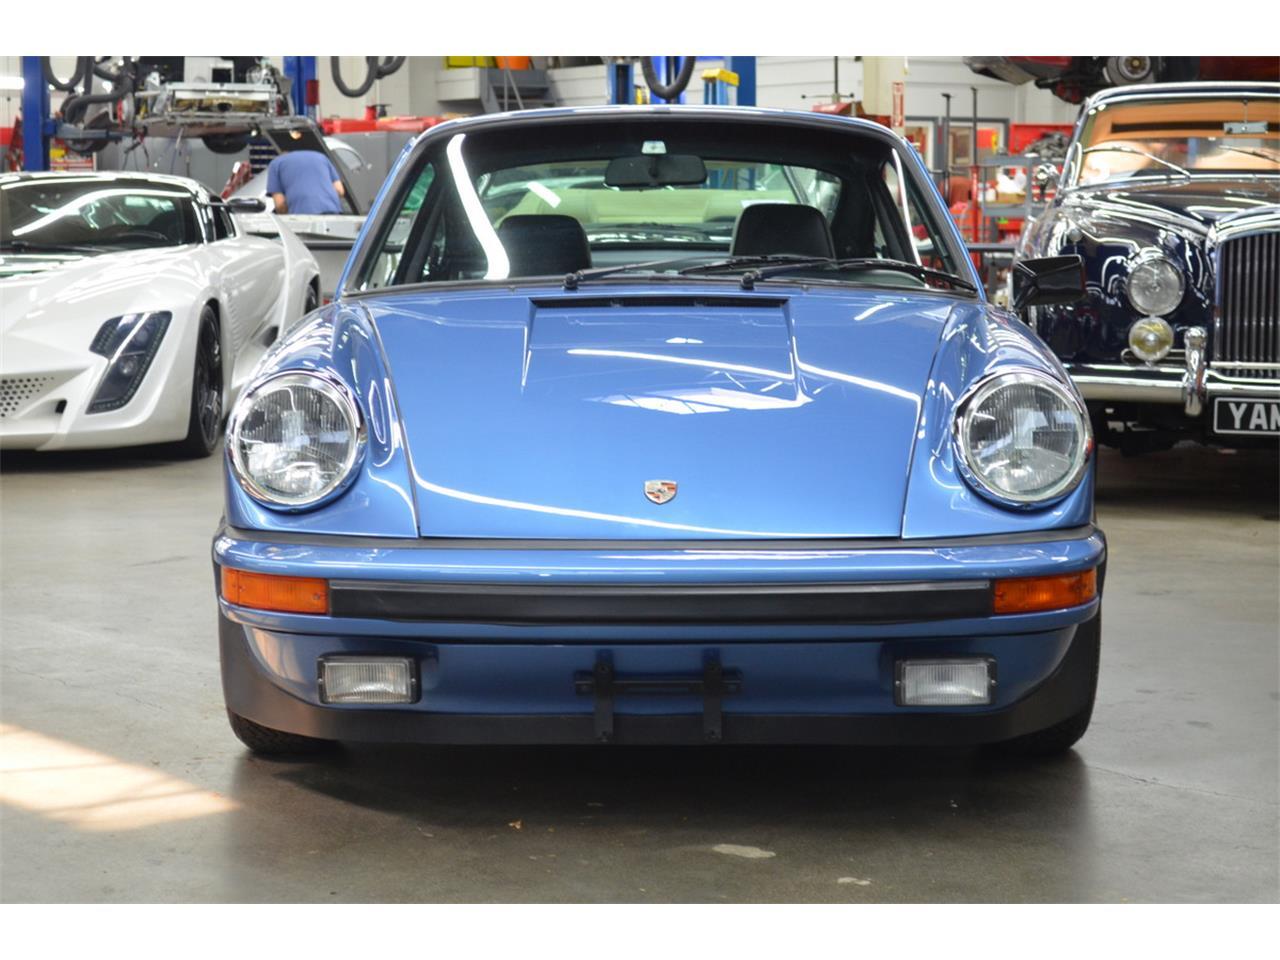 1974 Porsche 911 Carrera 2.7 (CC-1352128) for sale in Huntington Station, New York